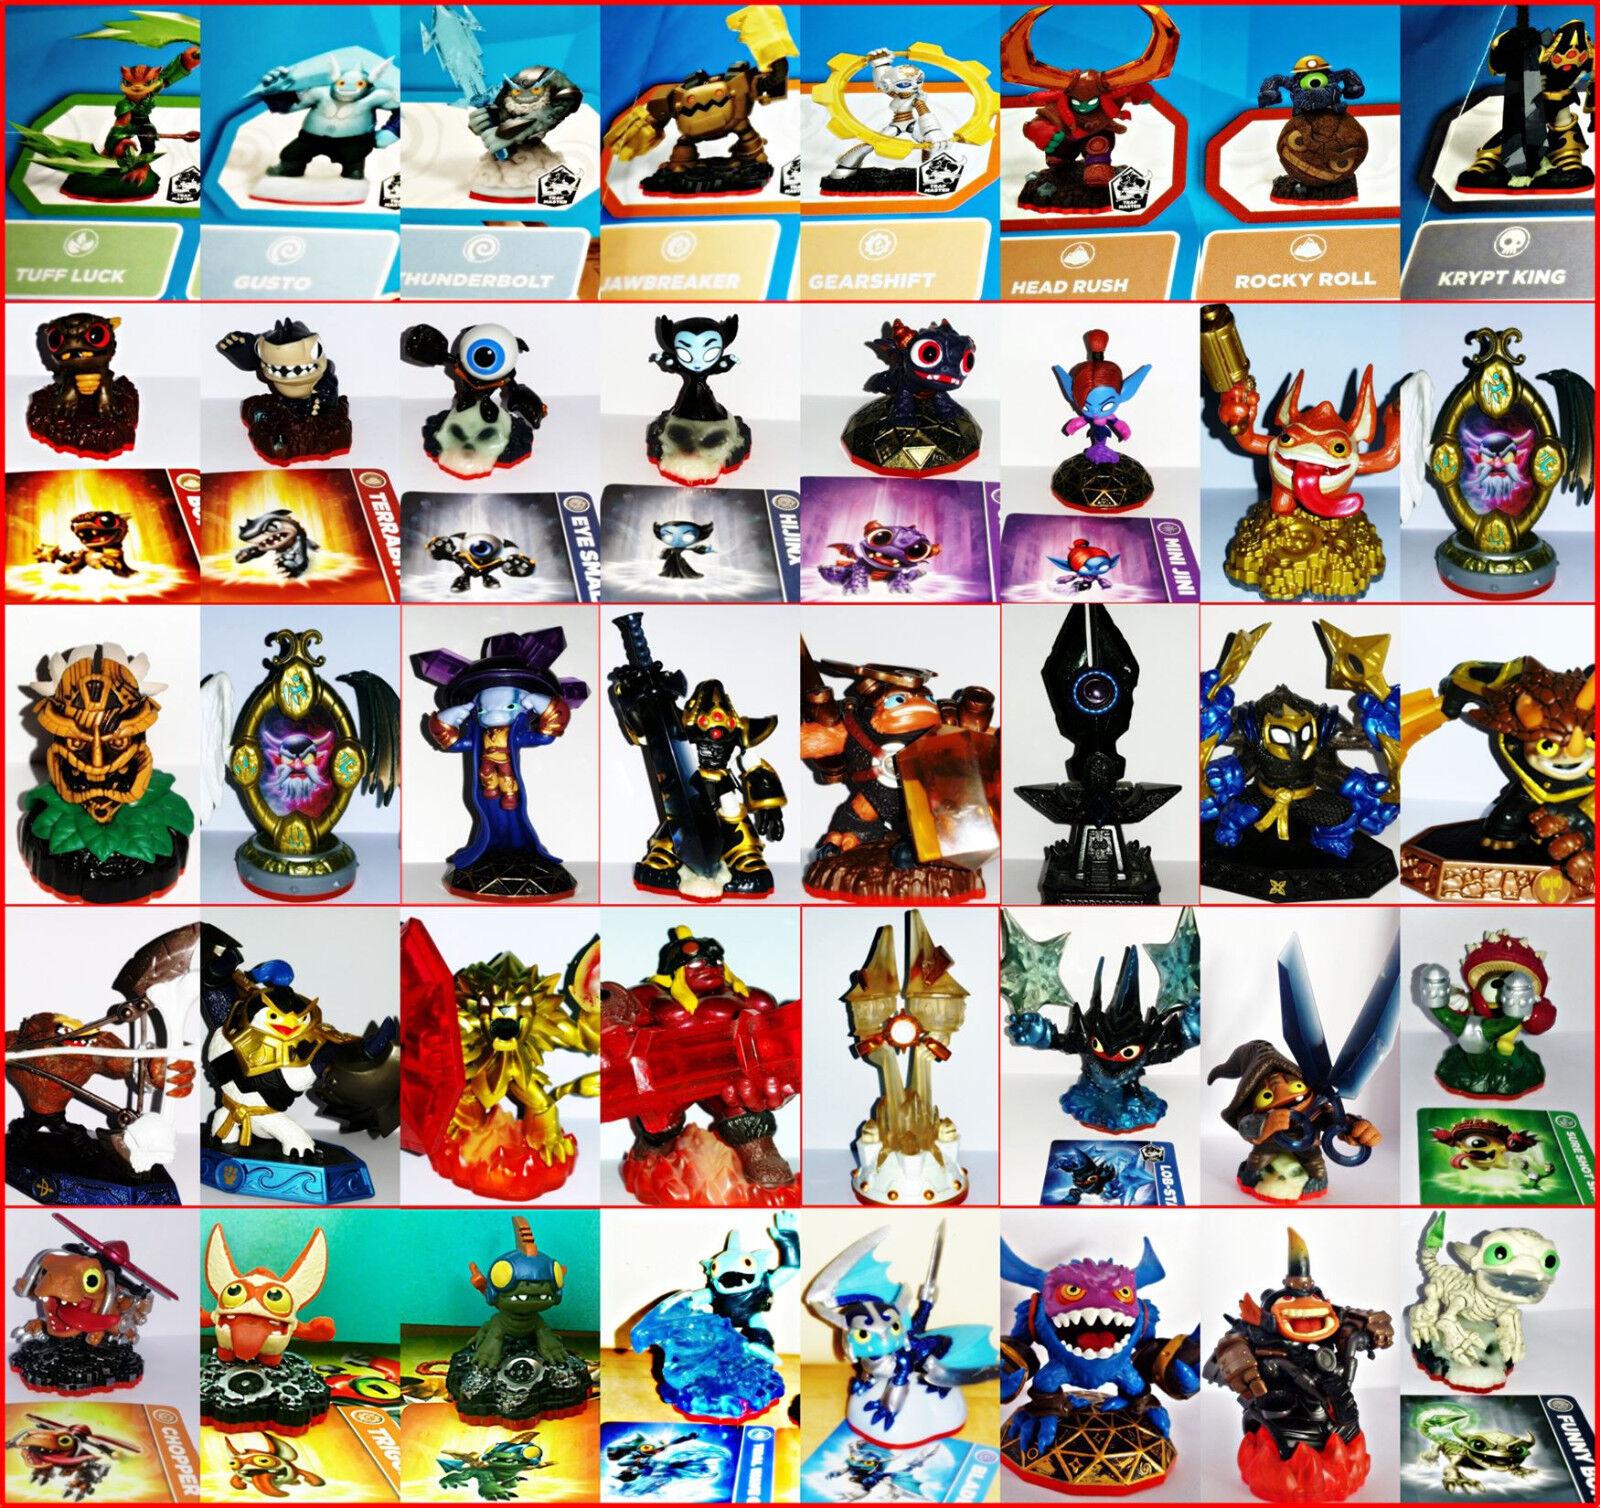 Skylanders Trap Team Figurines Séléction Tous Consoles Ps3, Ps4, Xbox, One, Wii,